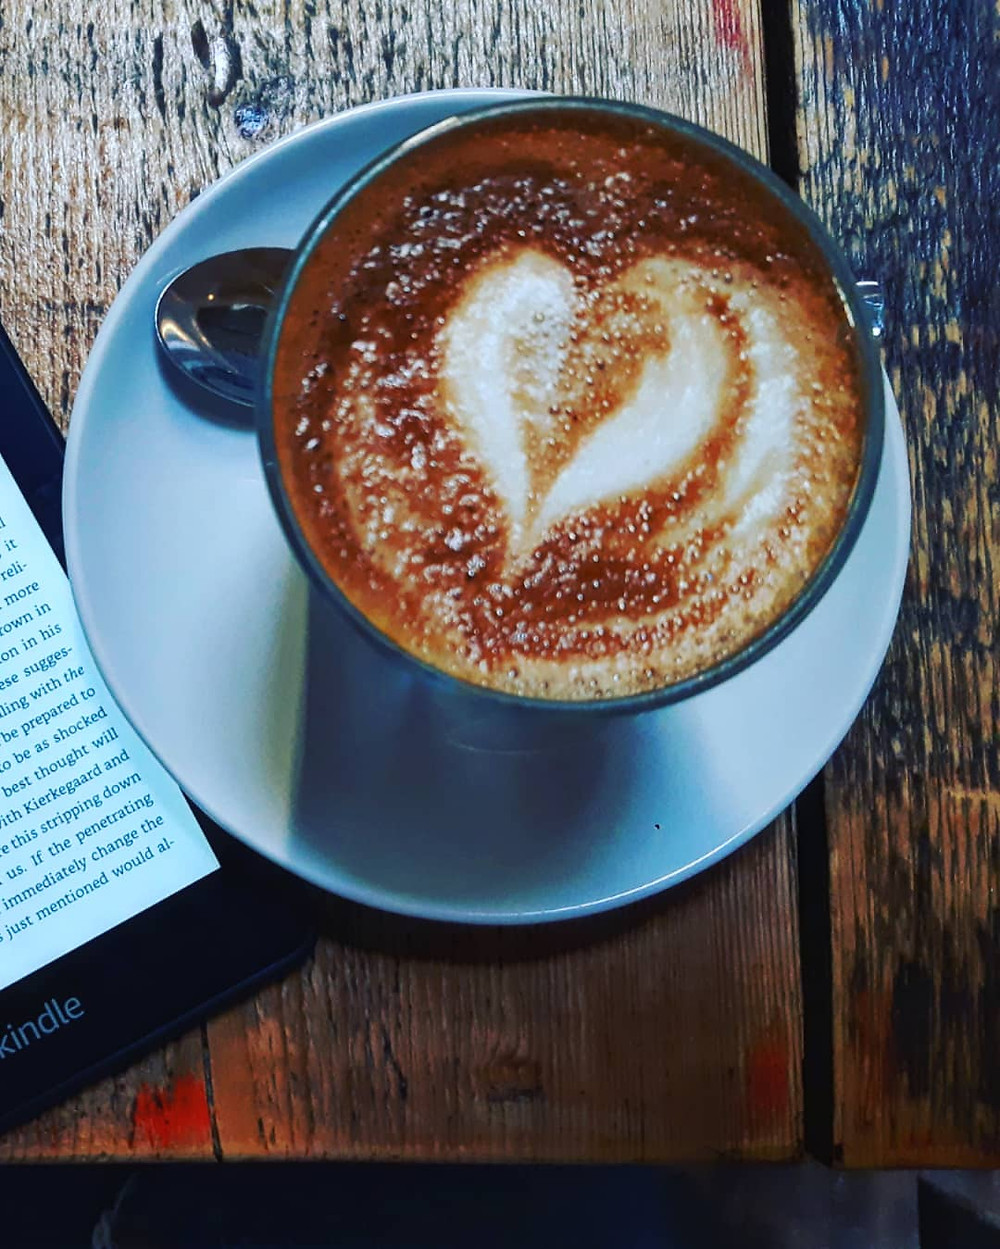 zivile kasparaviciute, vagabond, london, islington, islington coffee shop, art in islington, coffee roasters, london coffee, lithuanian artist, lietuviu menininkai